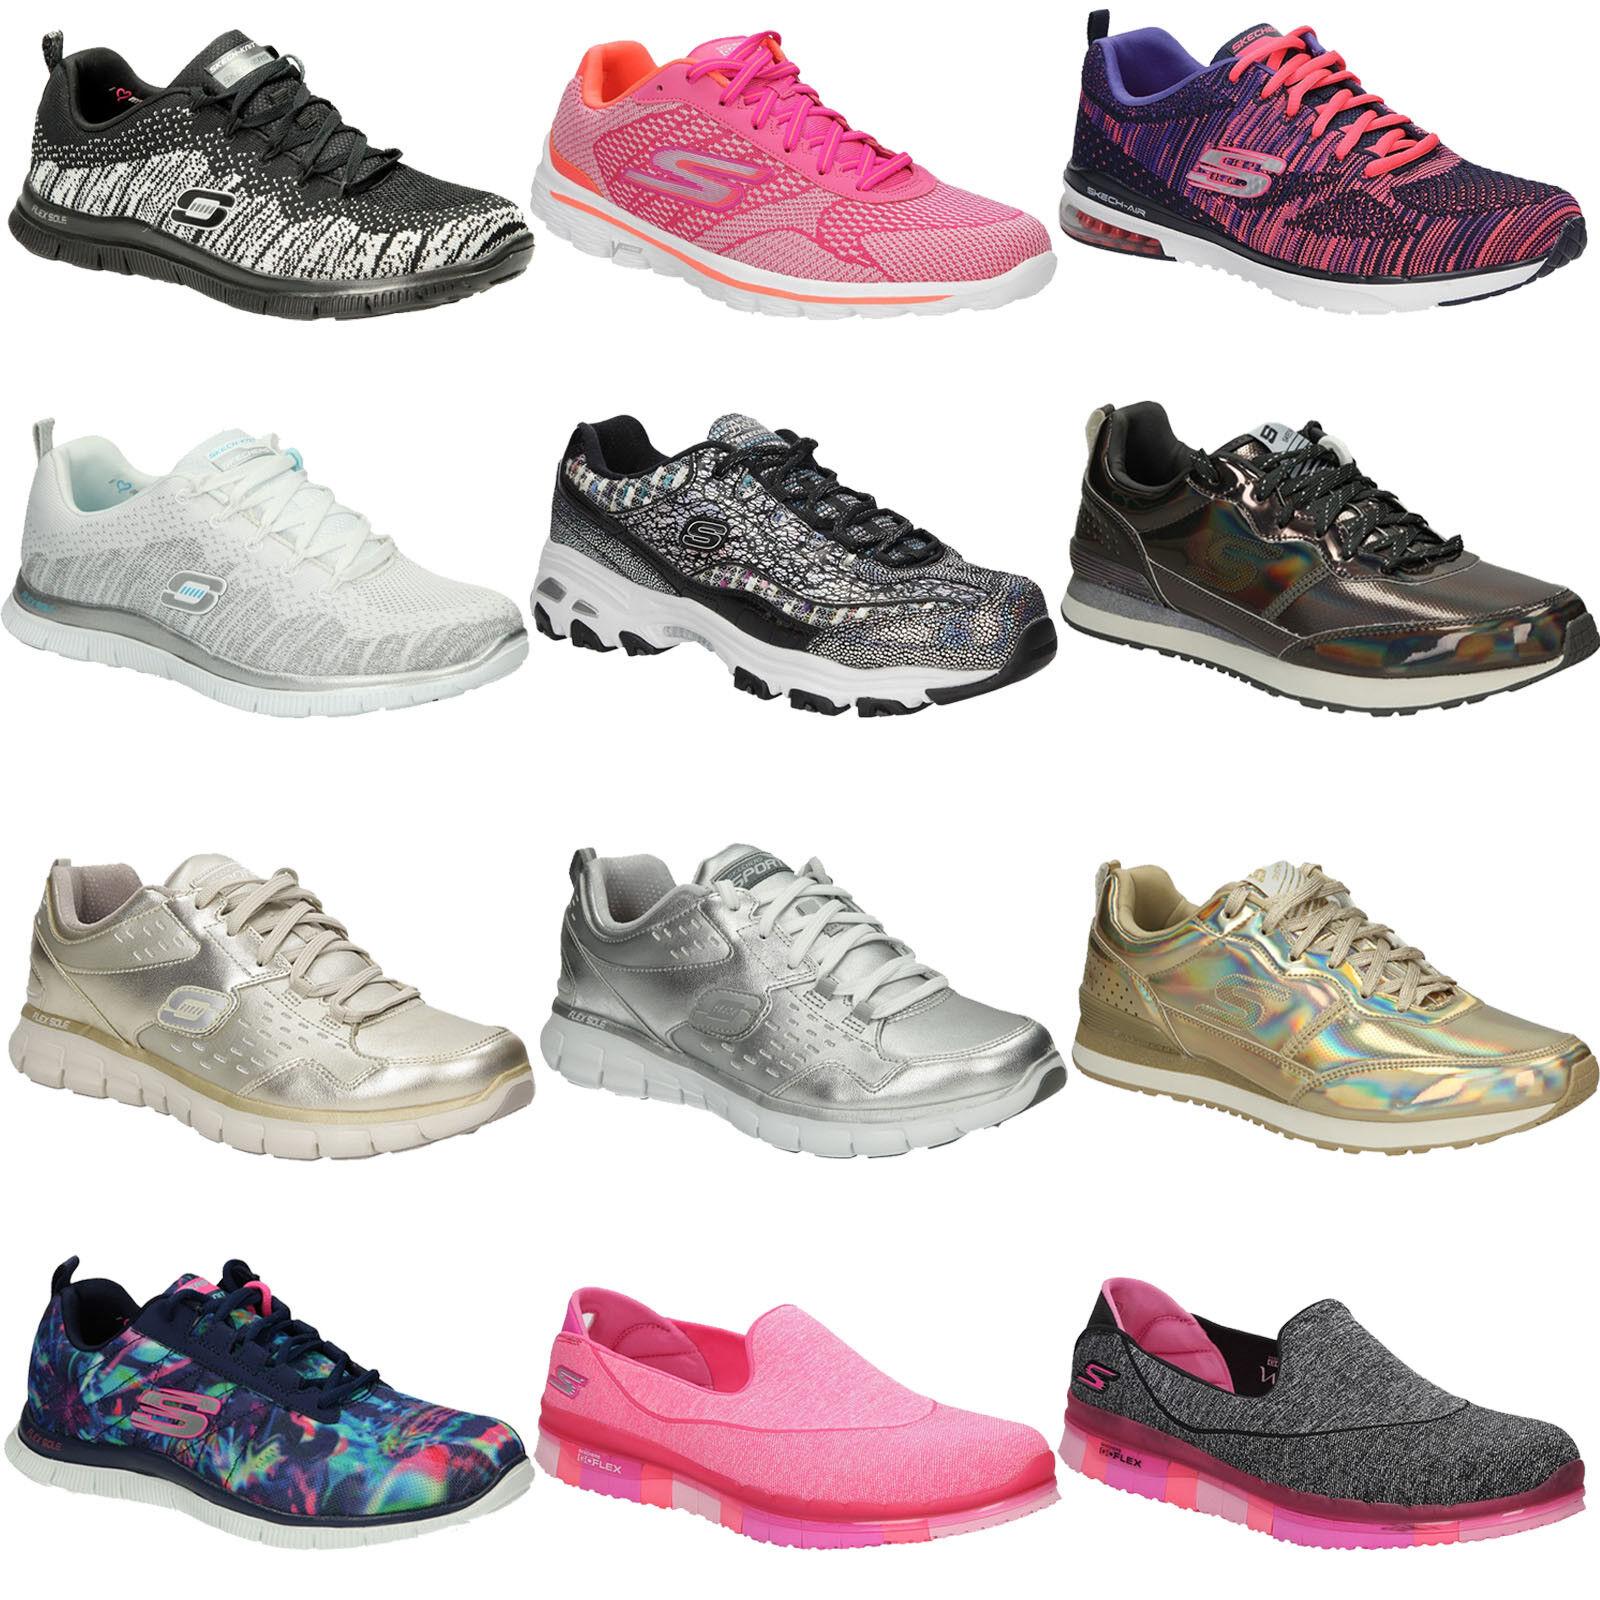 Zapatos promocionales para hombres y mujeres Skechers Sportschuhe Damenschuhe Ganzjährig Bequem Jugend Freizeit Gr. 36-41